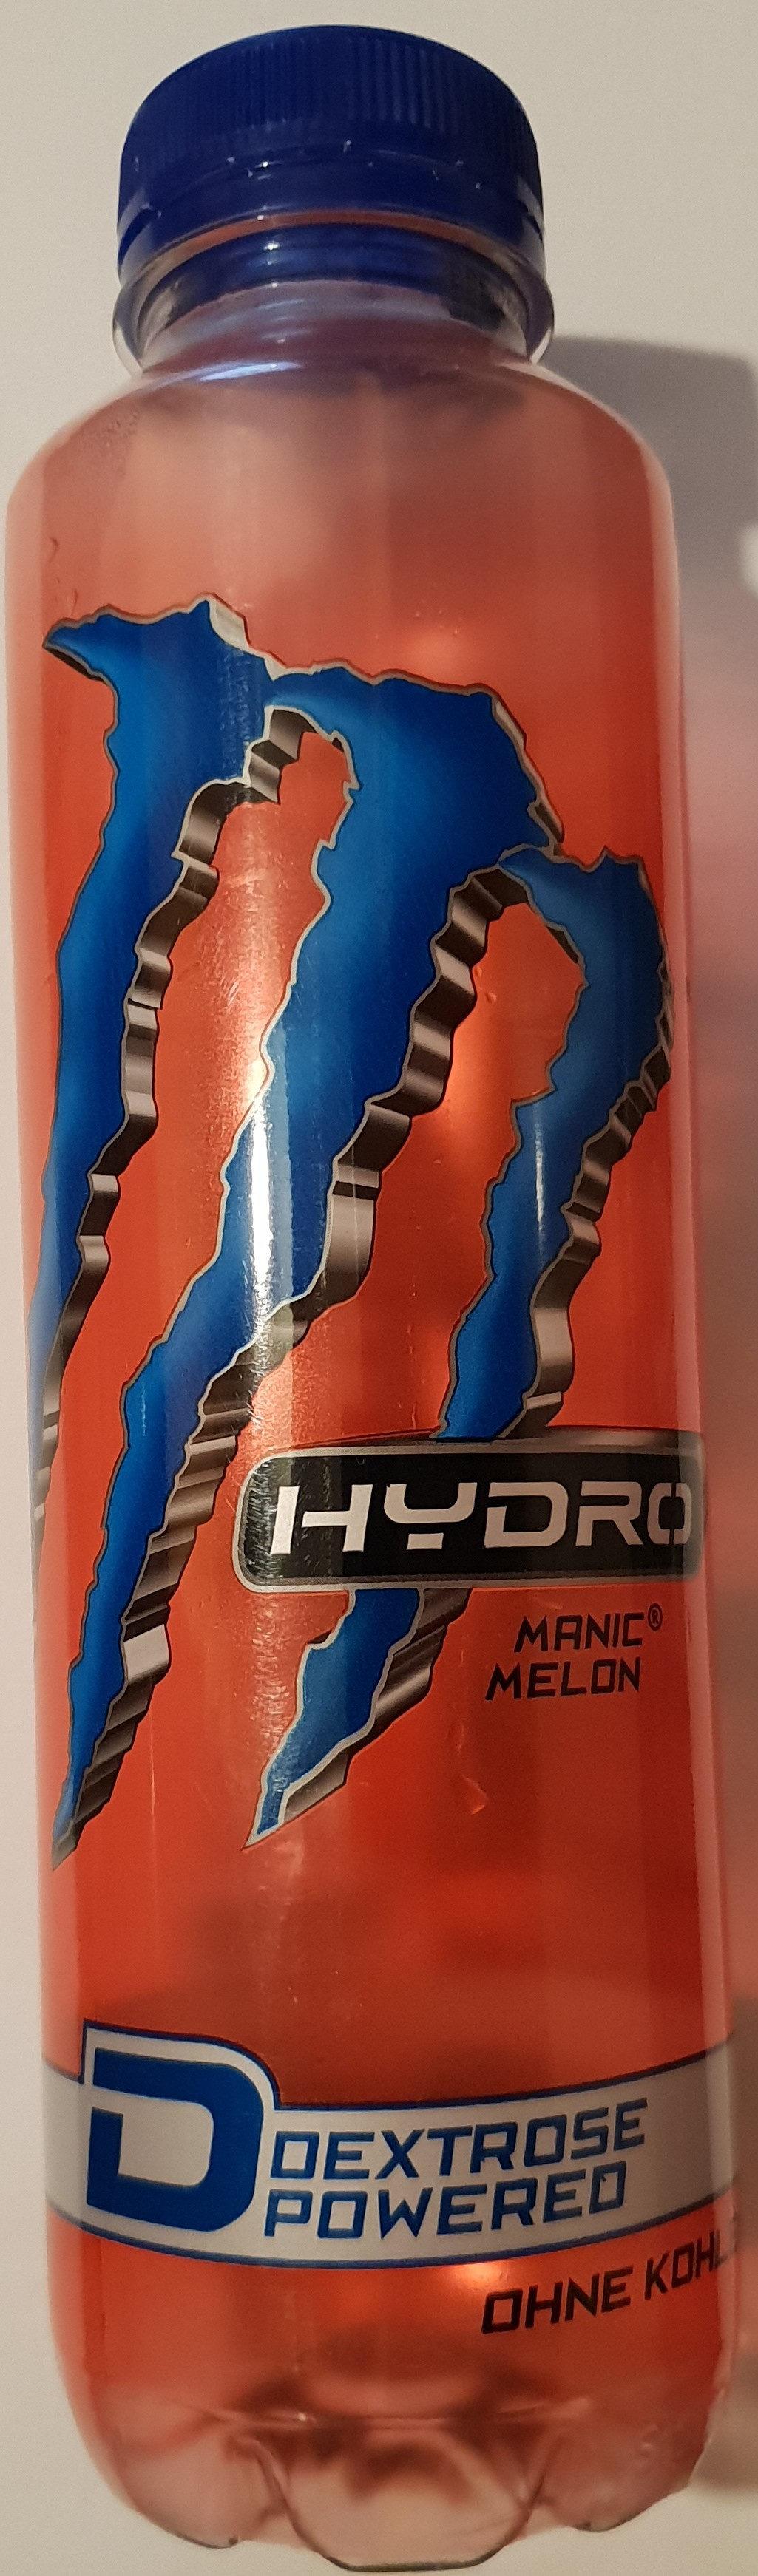 Hydro Manic Melon(R) - Produit